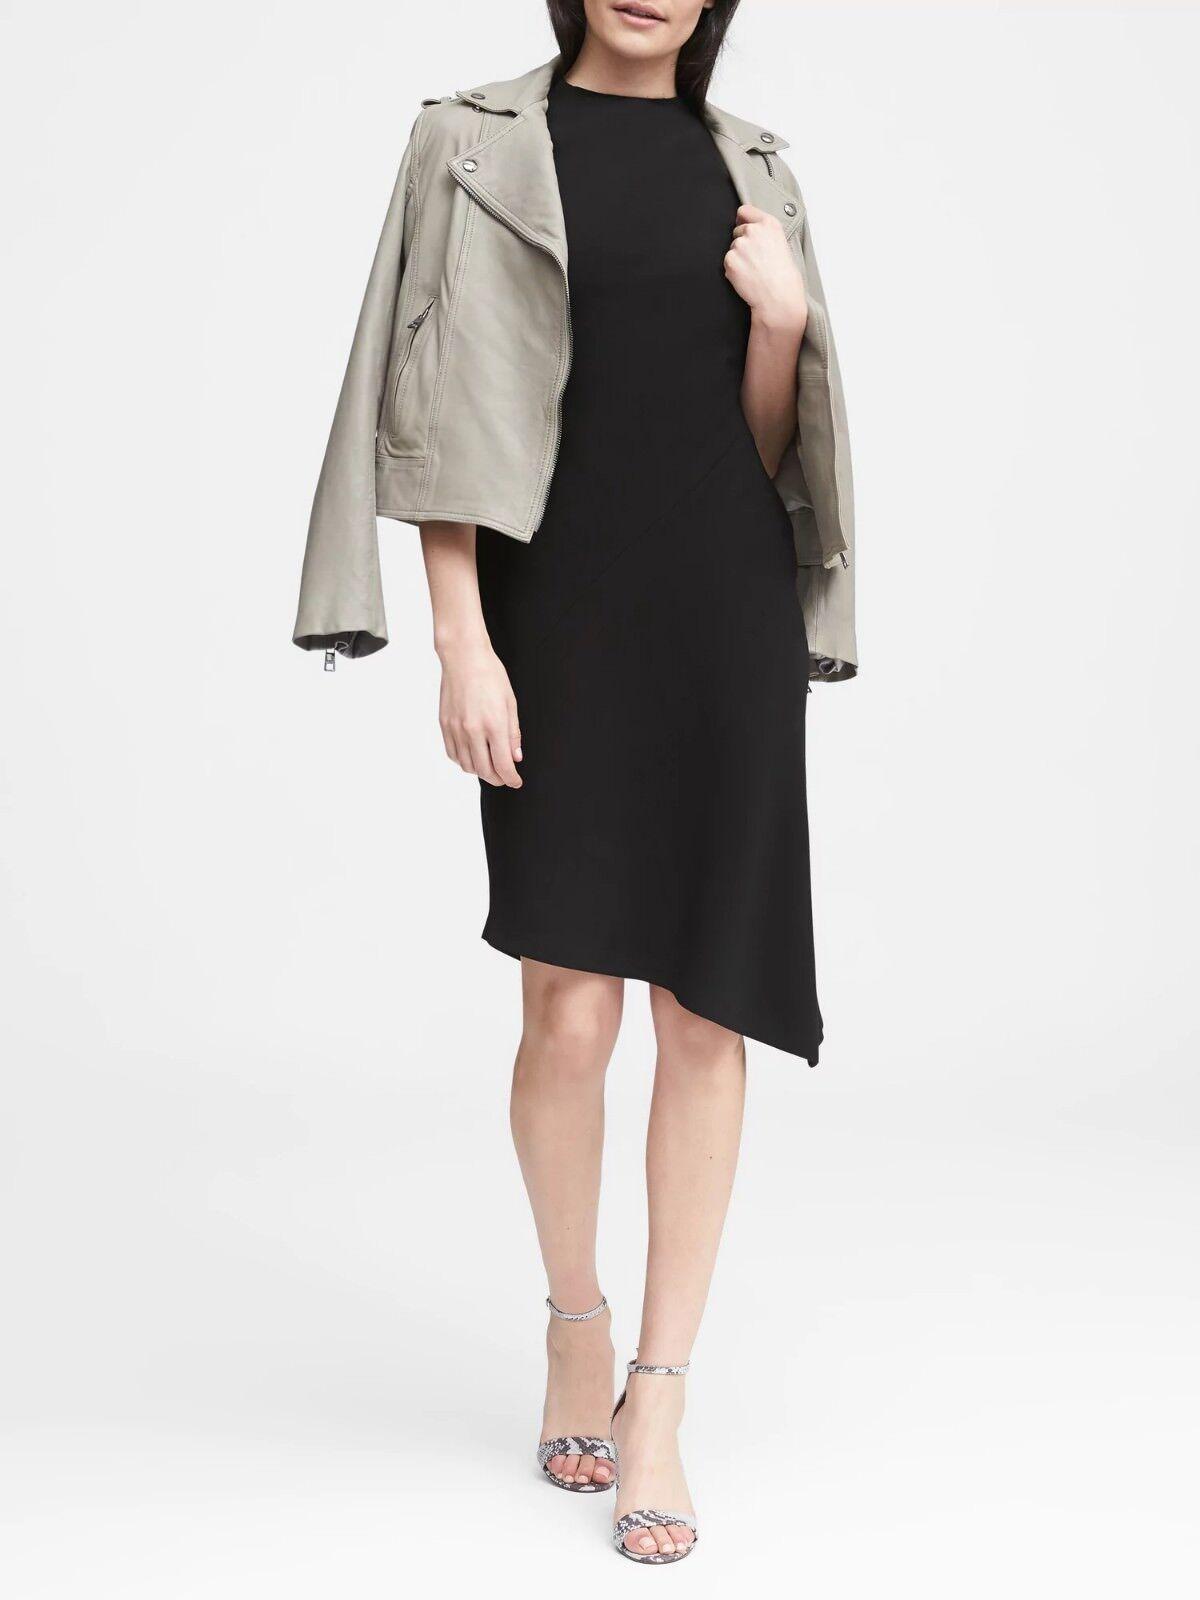 Banana Republic Mock-Neck Sheath Dress,schwarz Größe 14       E415